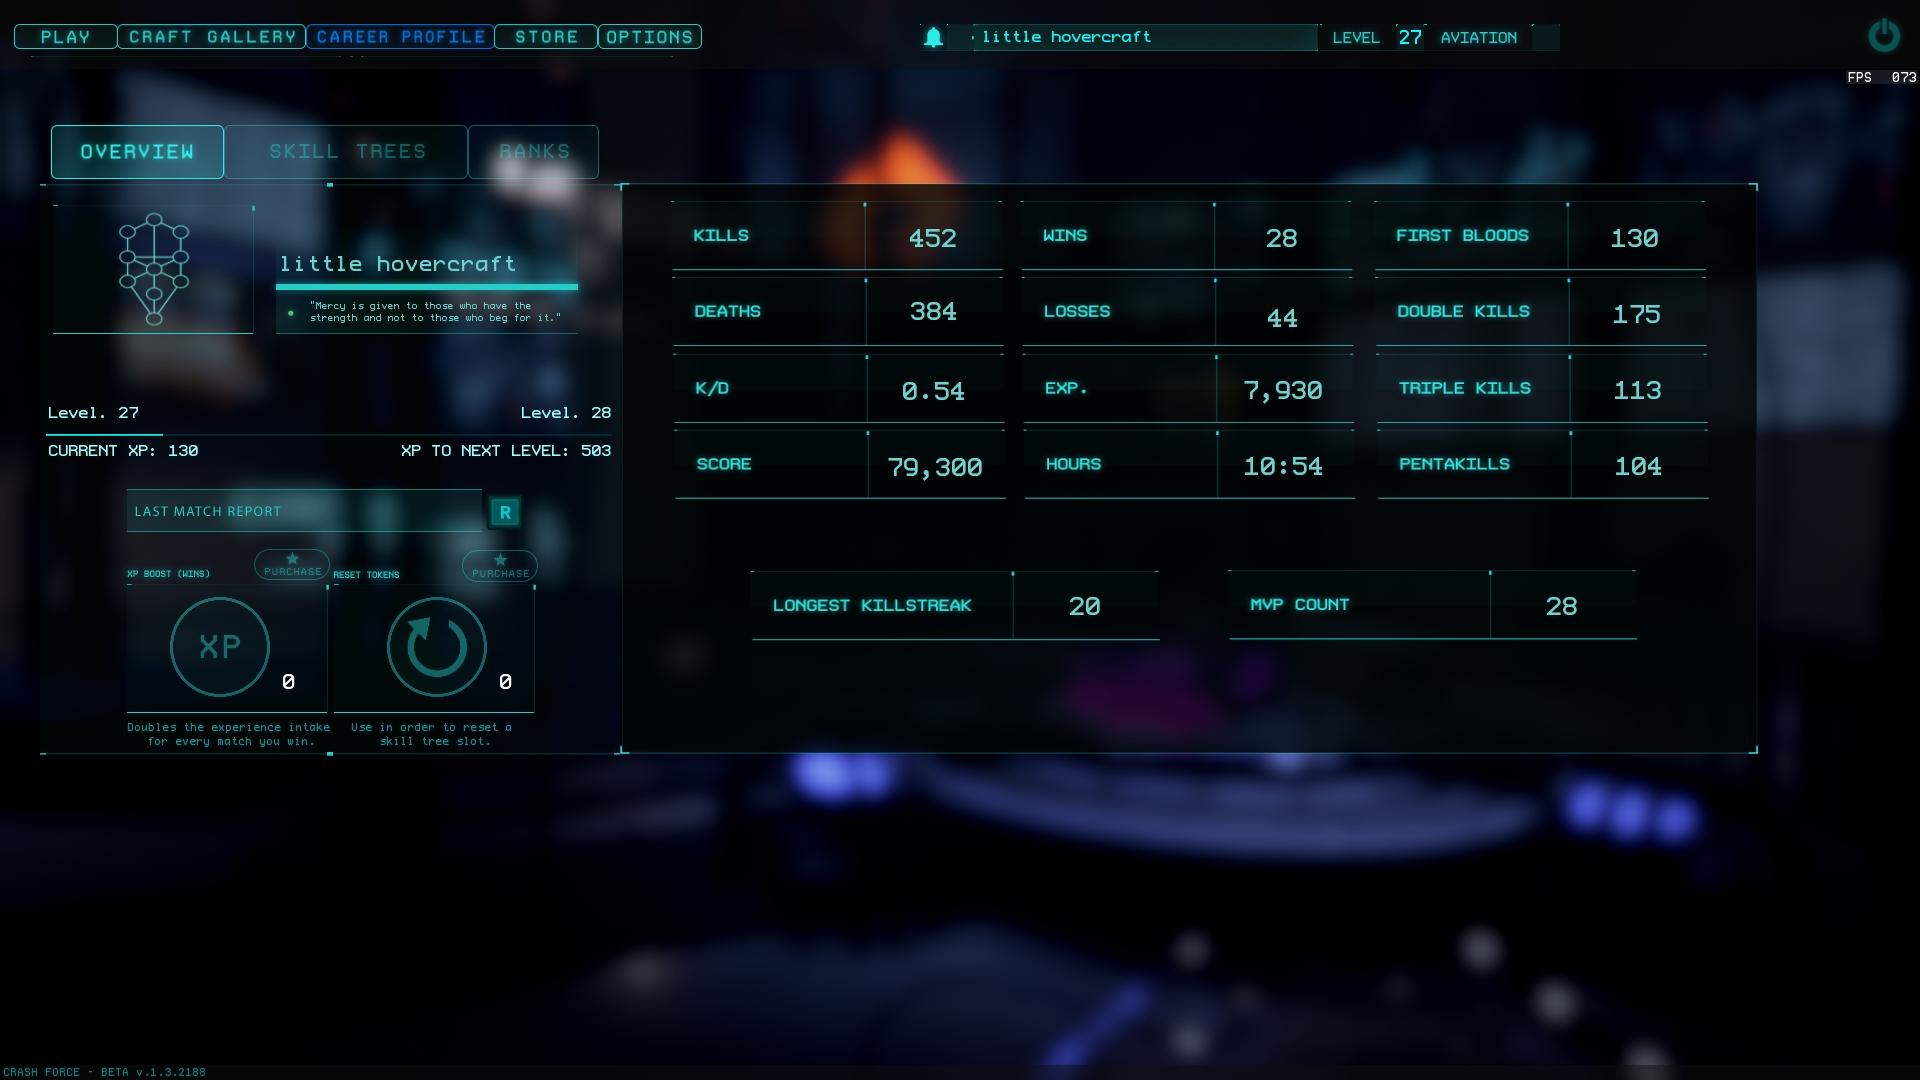 Crash Force Career Profile